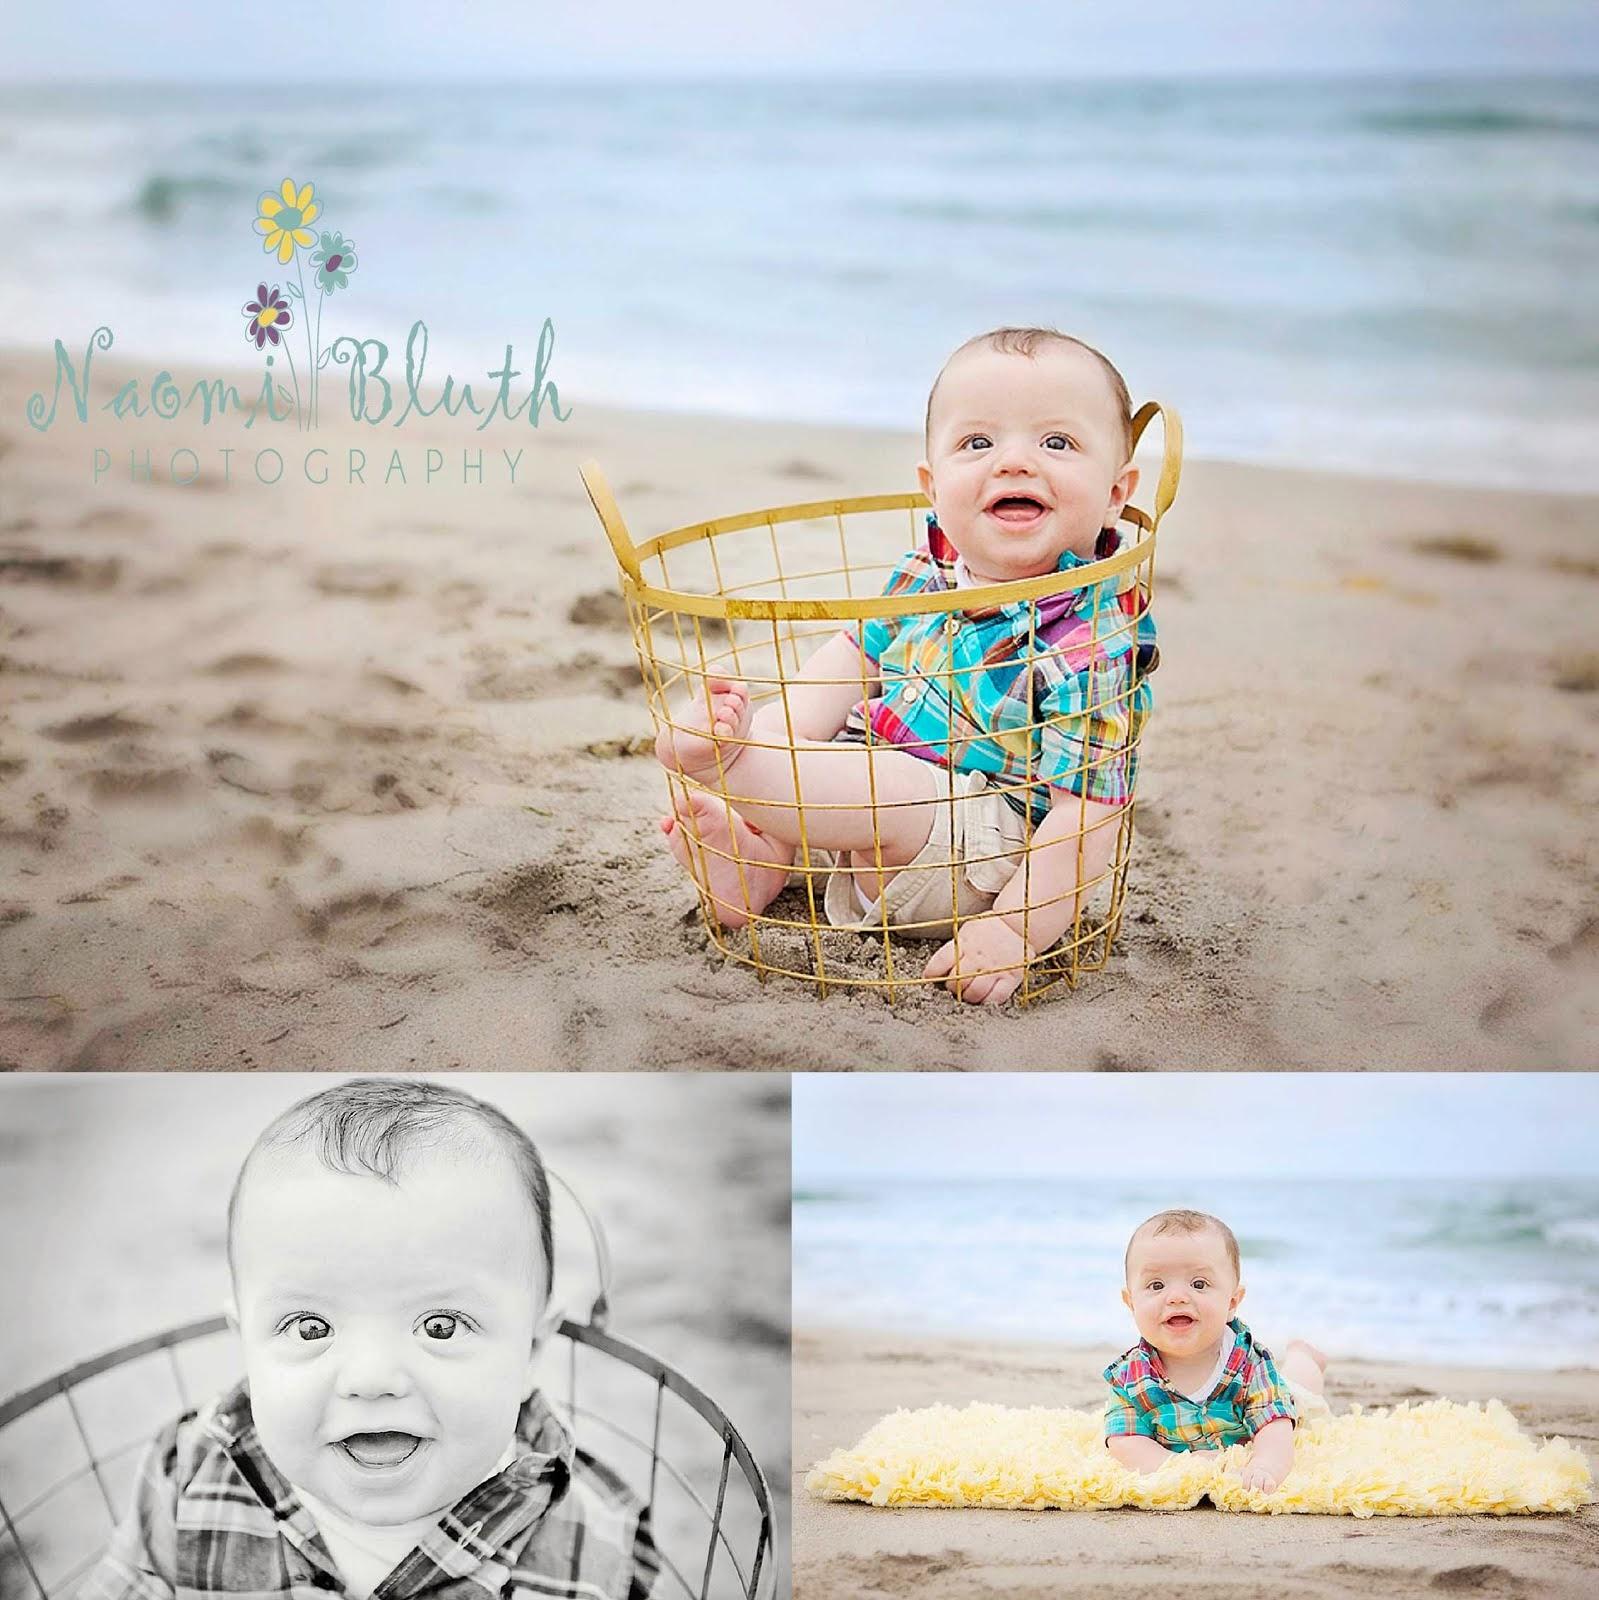 Boca raton family beach photographer south florida beach baby photographer 6 month old portraits lentino family